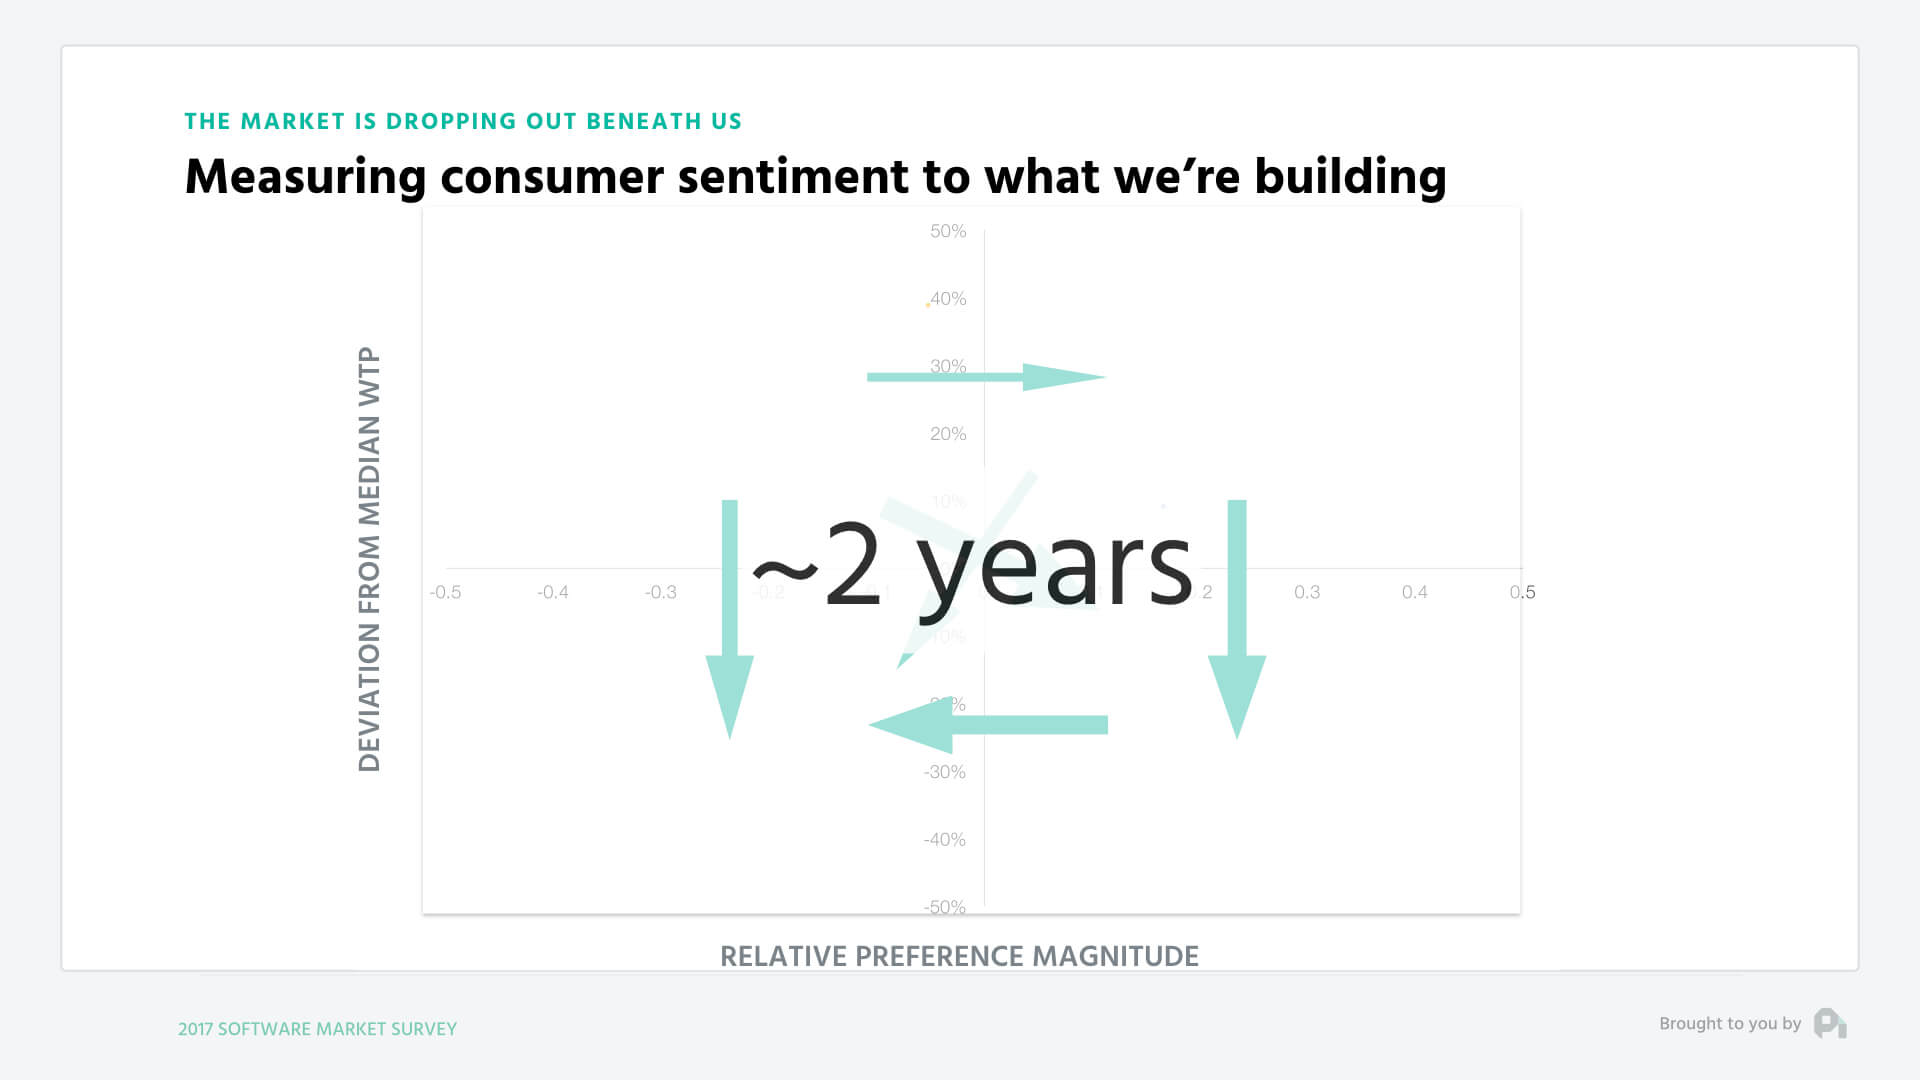 MeasuringConsumerSentimentTwoYears (1)